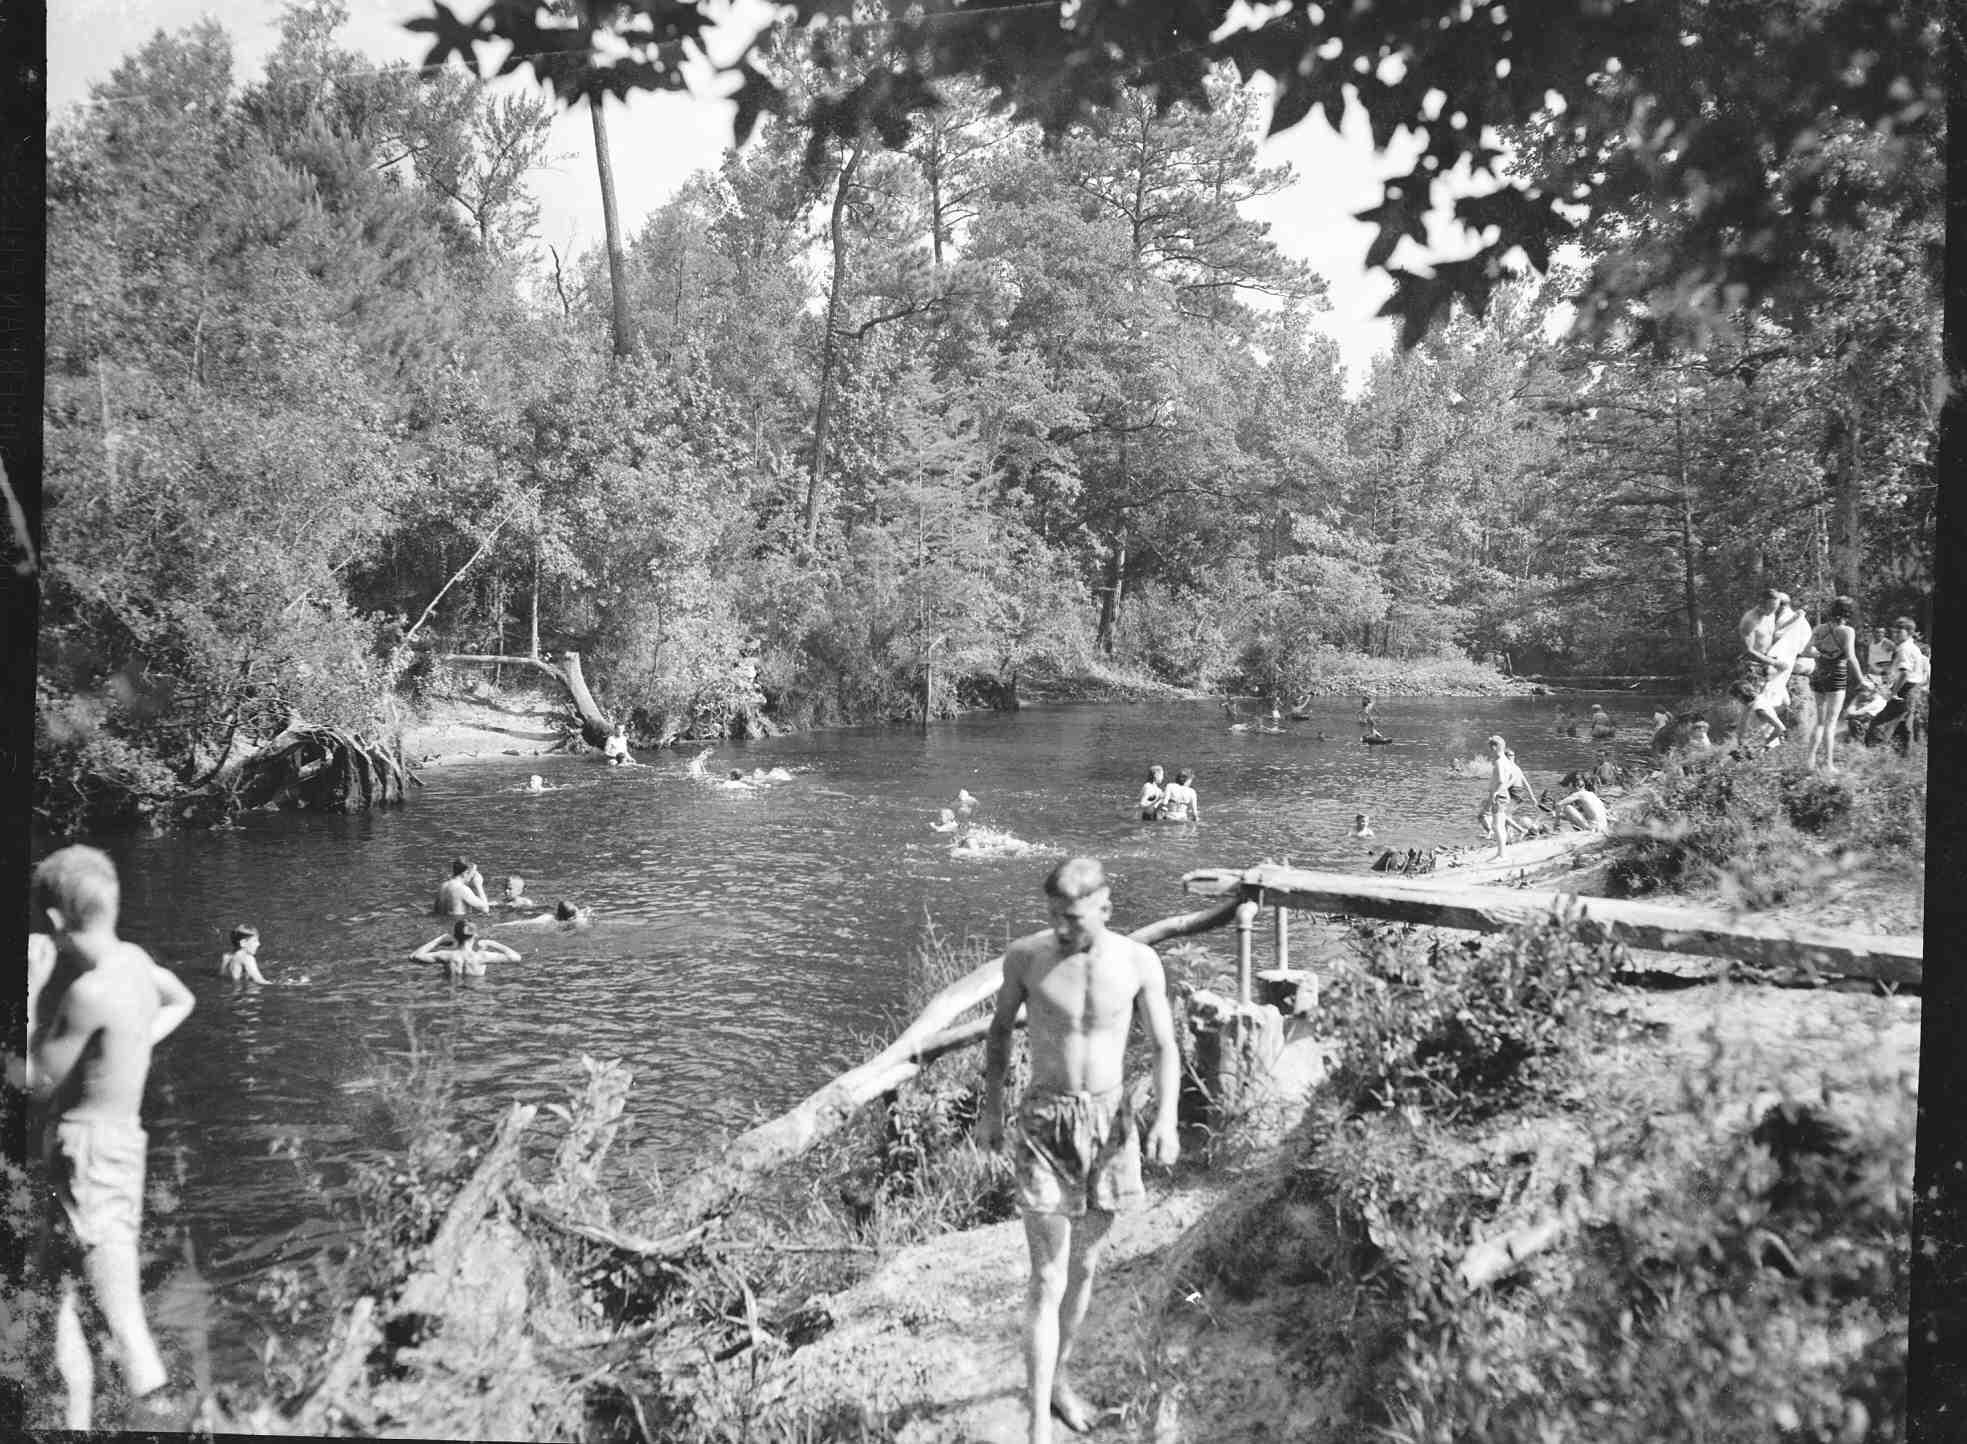 darlpict-black-creek-bethay-hole-50s_16154438782_o.jpg